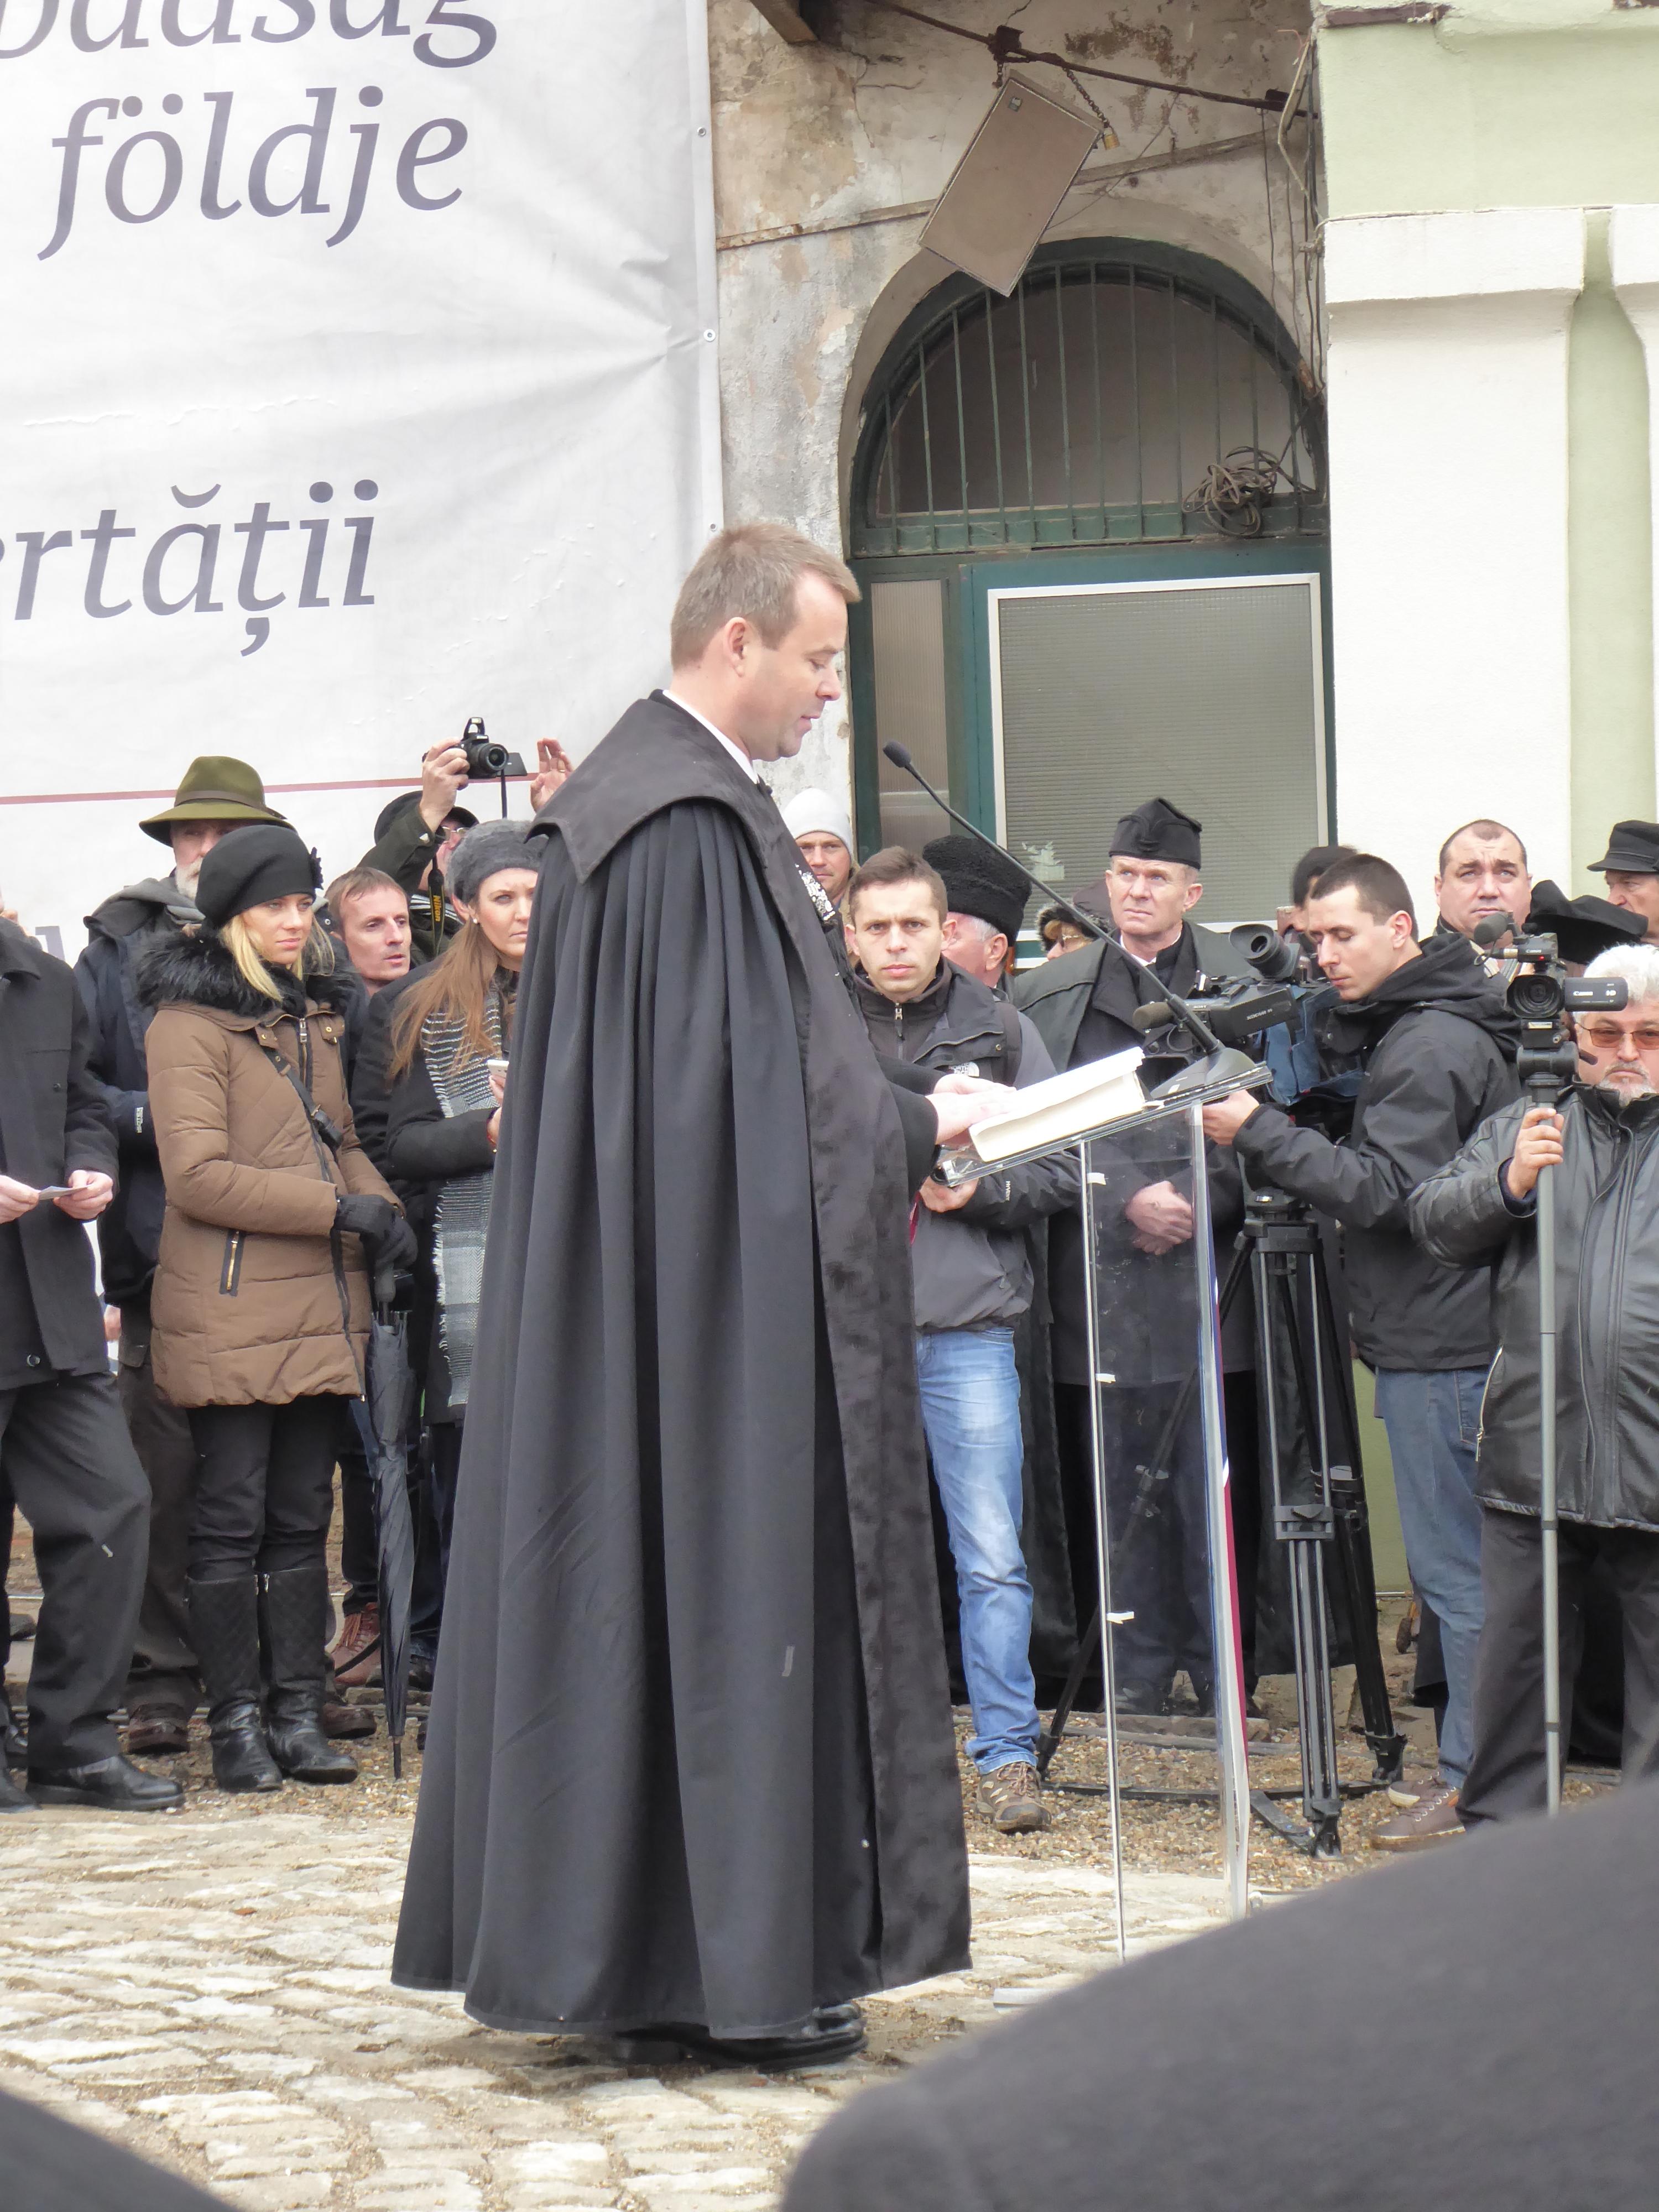 Rev David Gyero deputy bishop of the Hungarian Unitarian Church delivers the homily